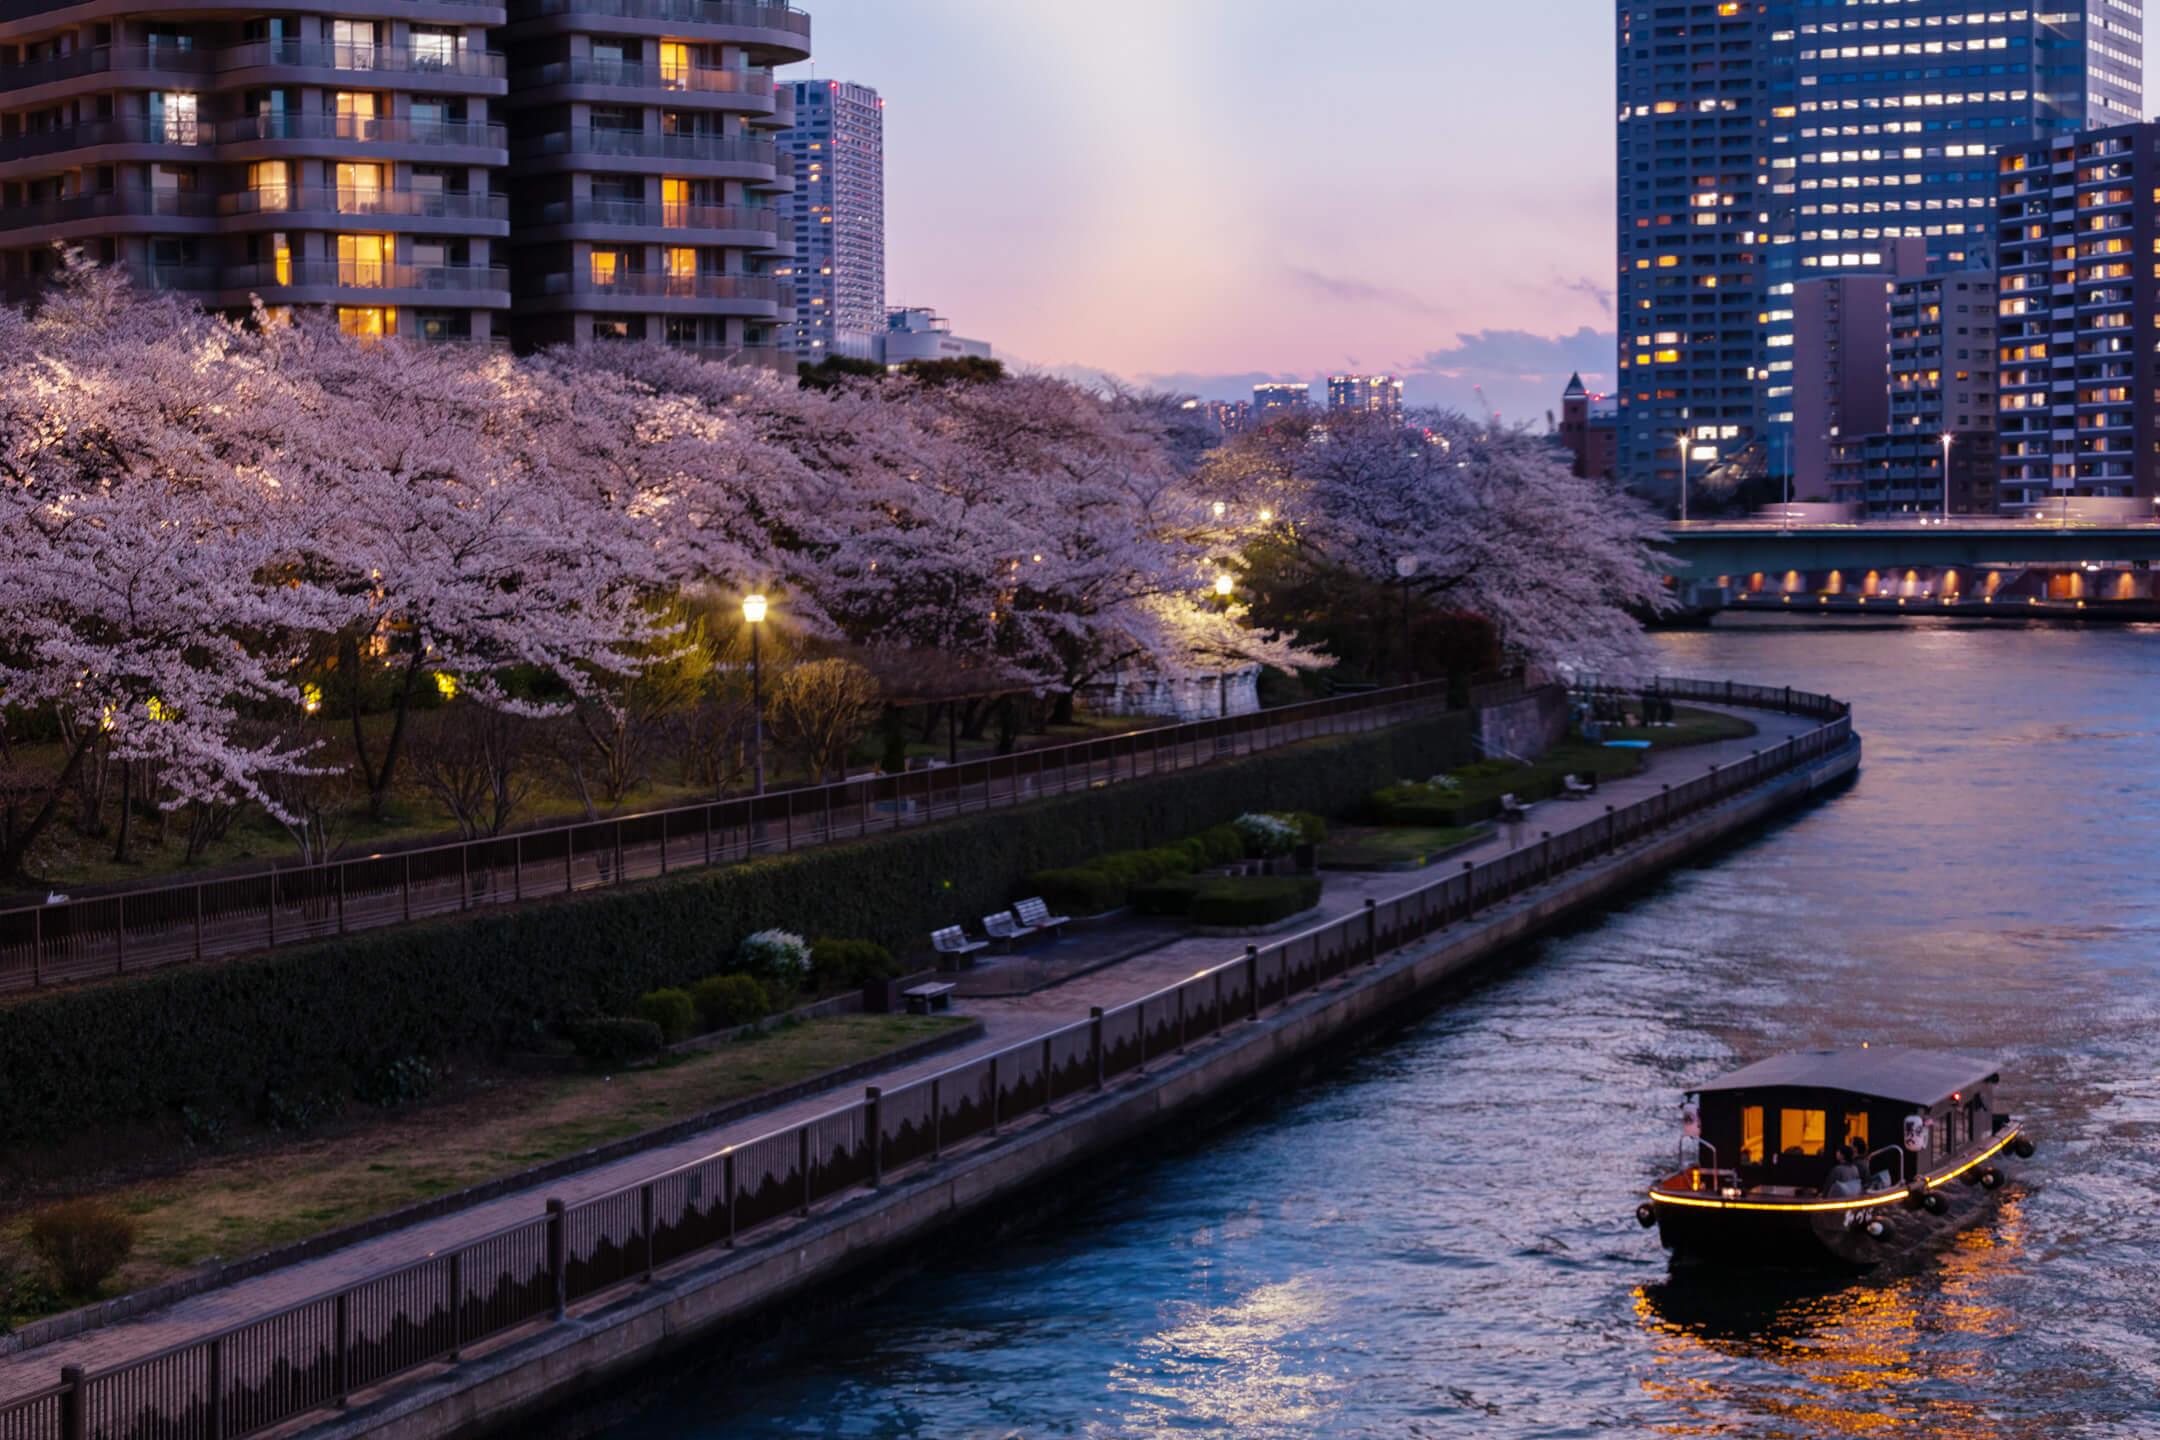 花見 桜 東京 隅田川 Sumida river Cherry blossom Tokyo 人力車 着物 Kimono_舟